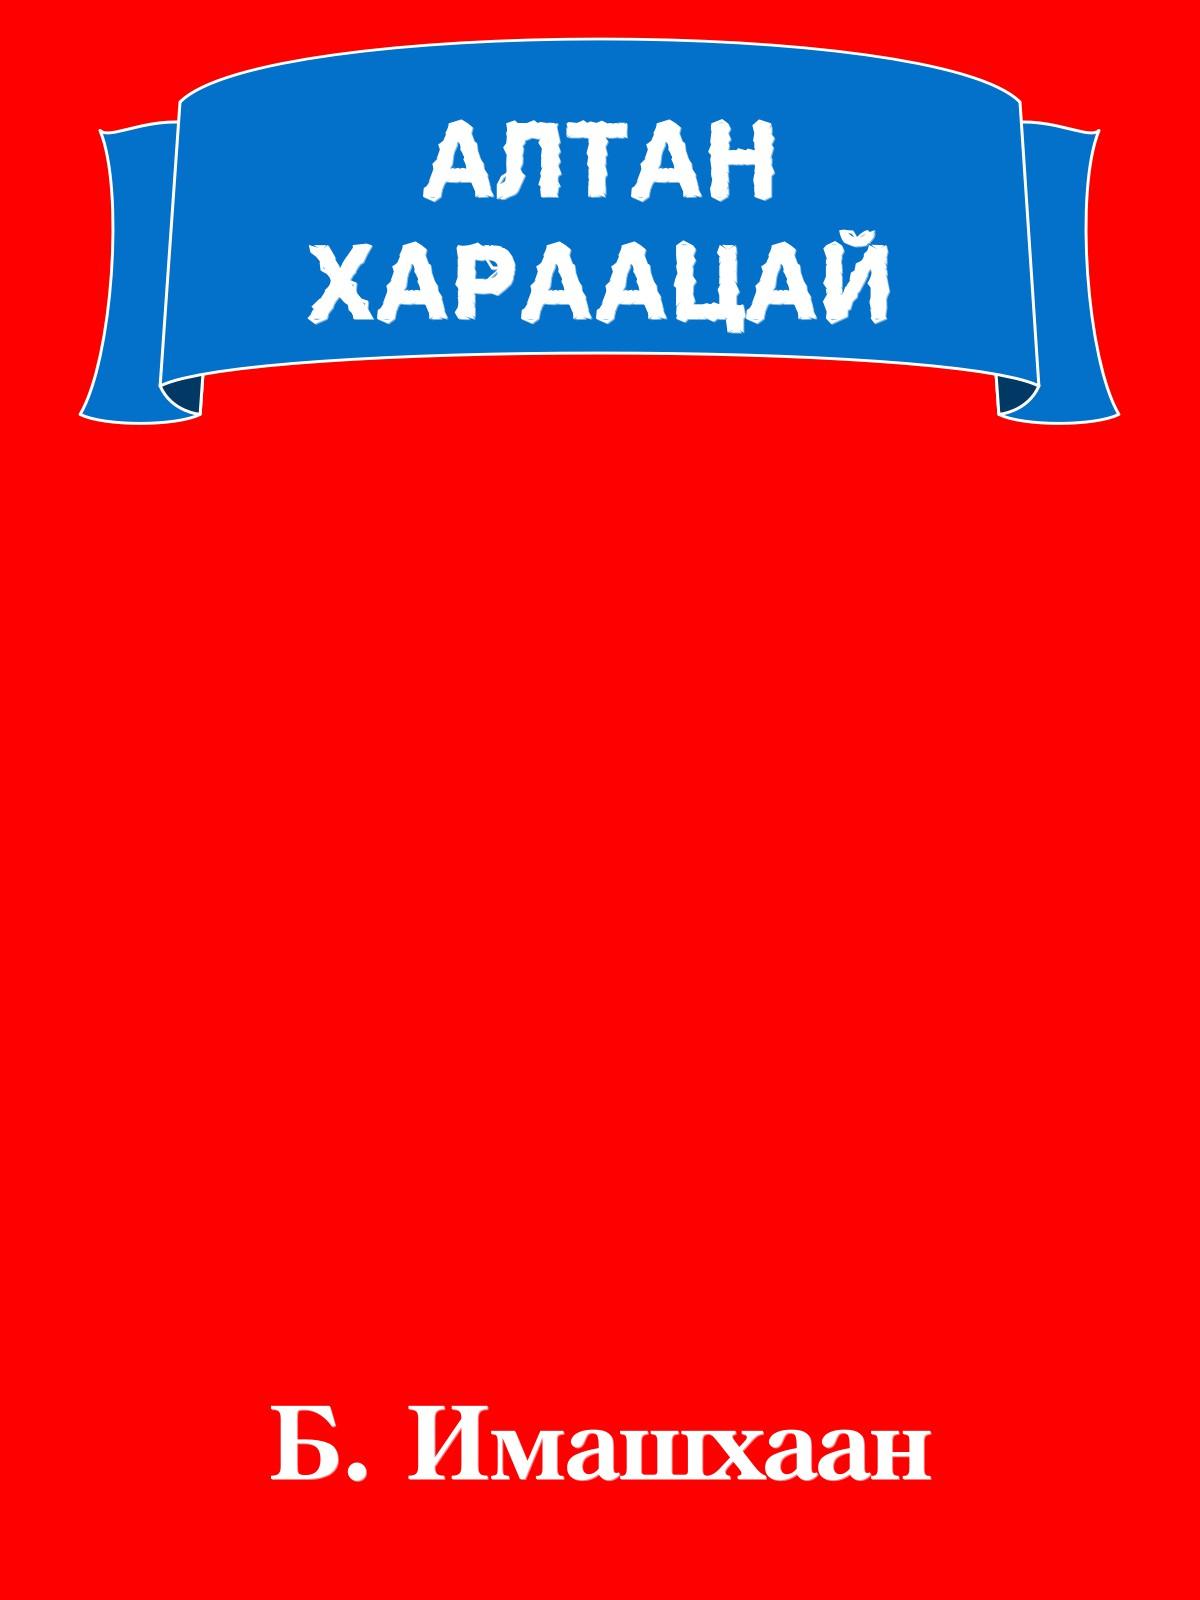 АЛТАН ХАРААЦАЙ